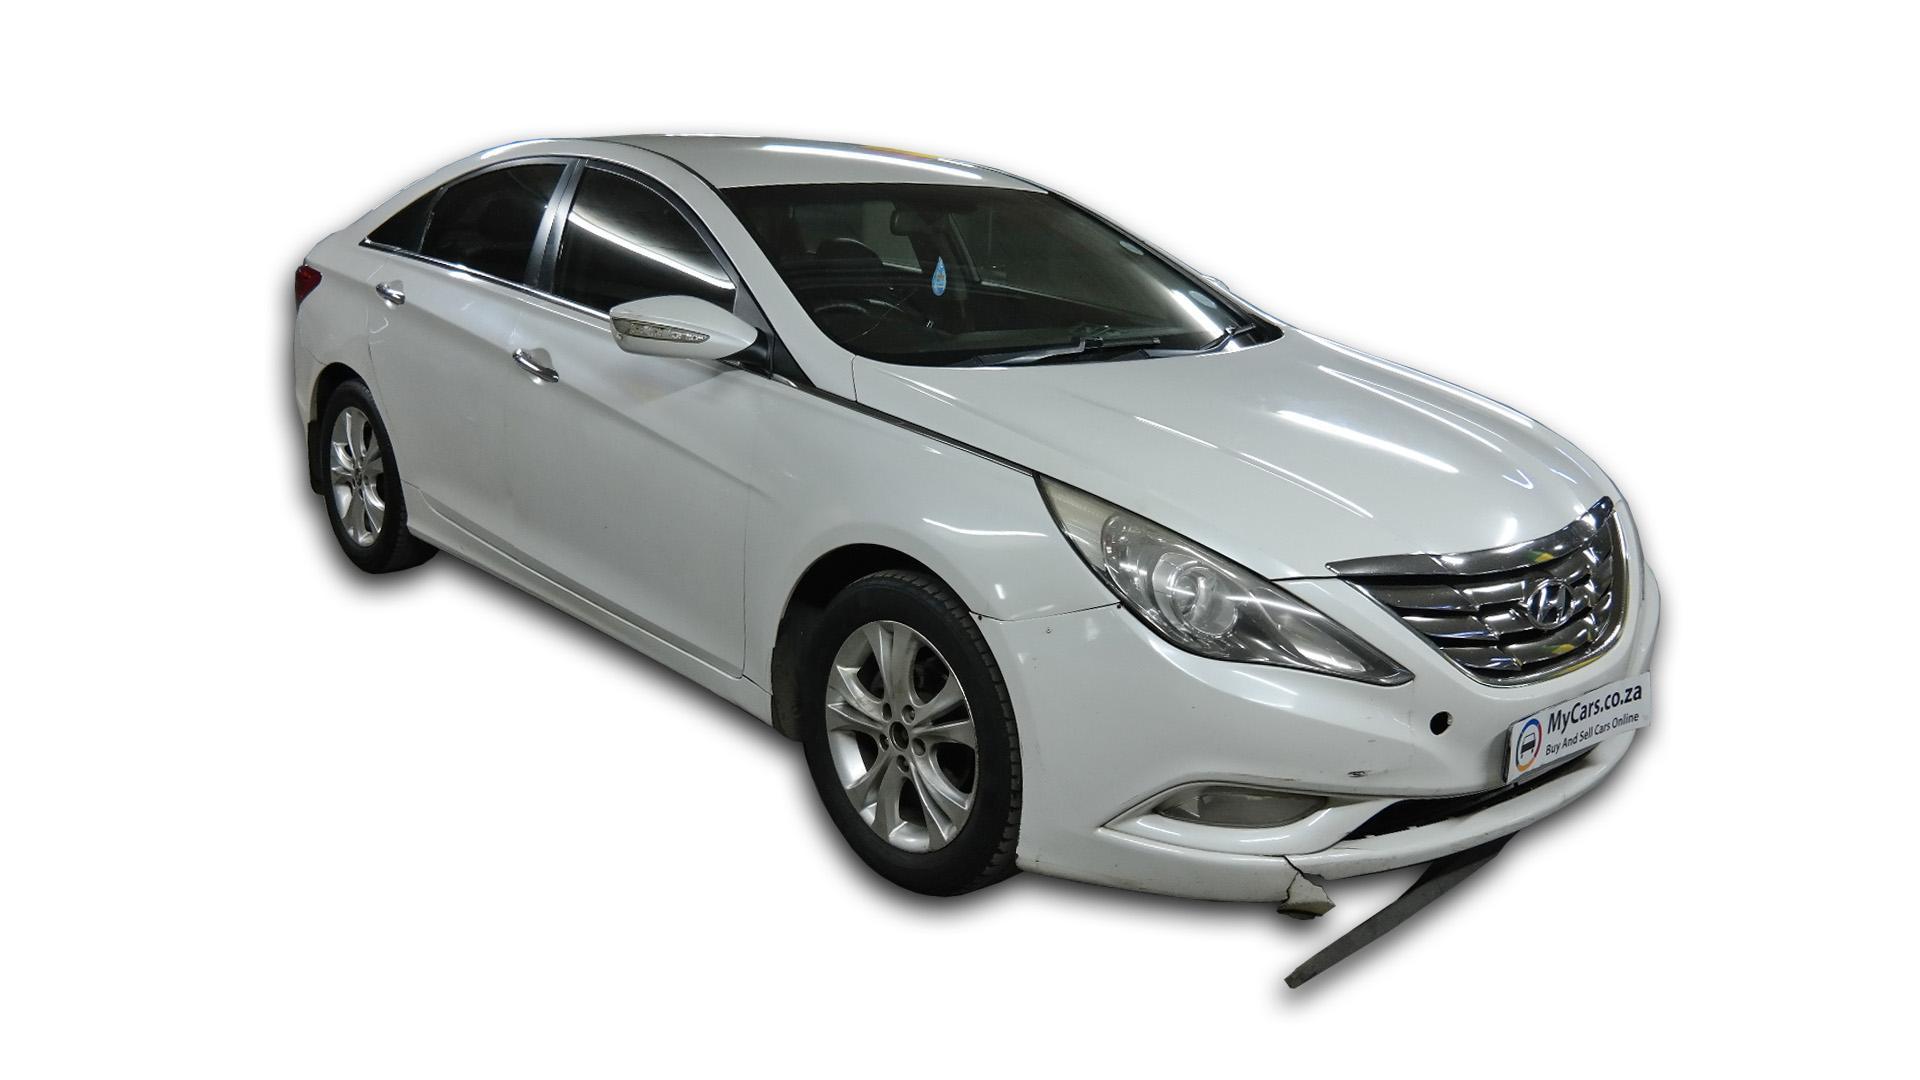 Hyundai Sonata 2.4 GLS/PREMIUM